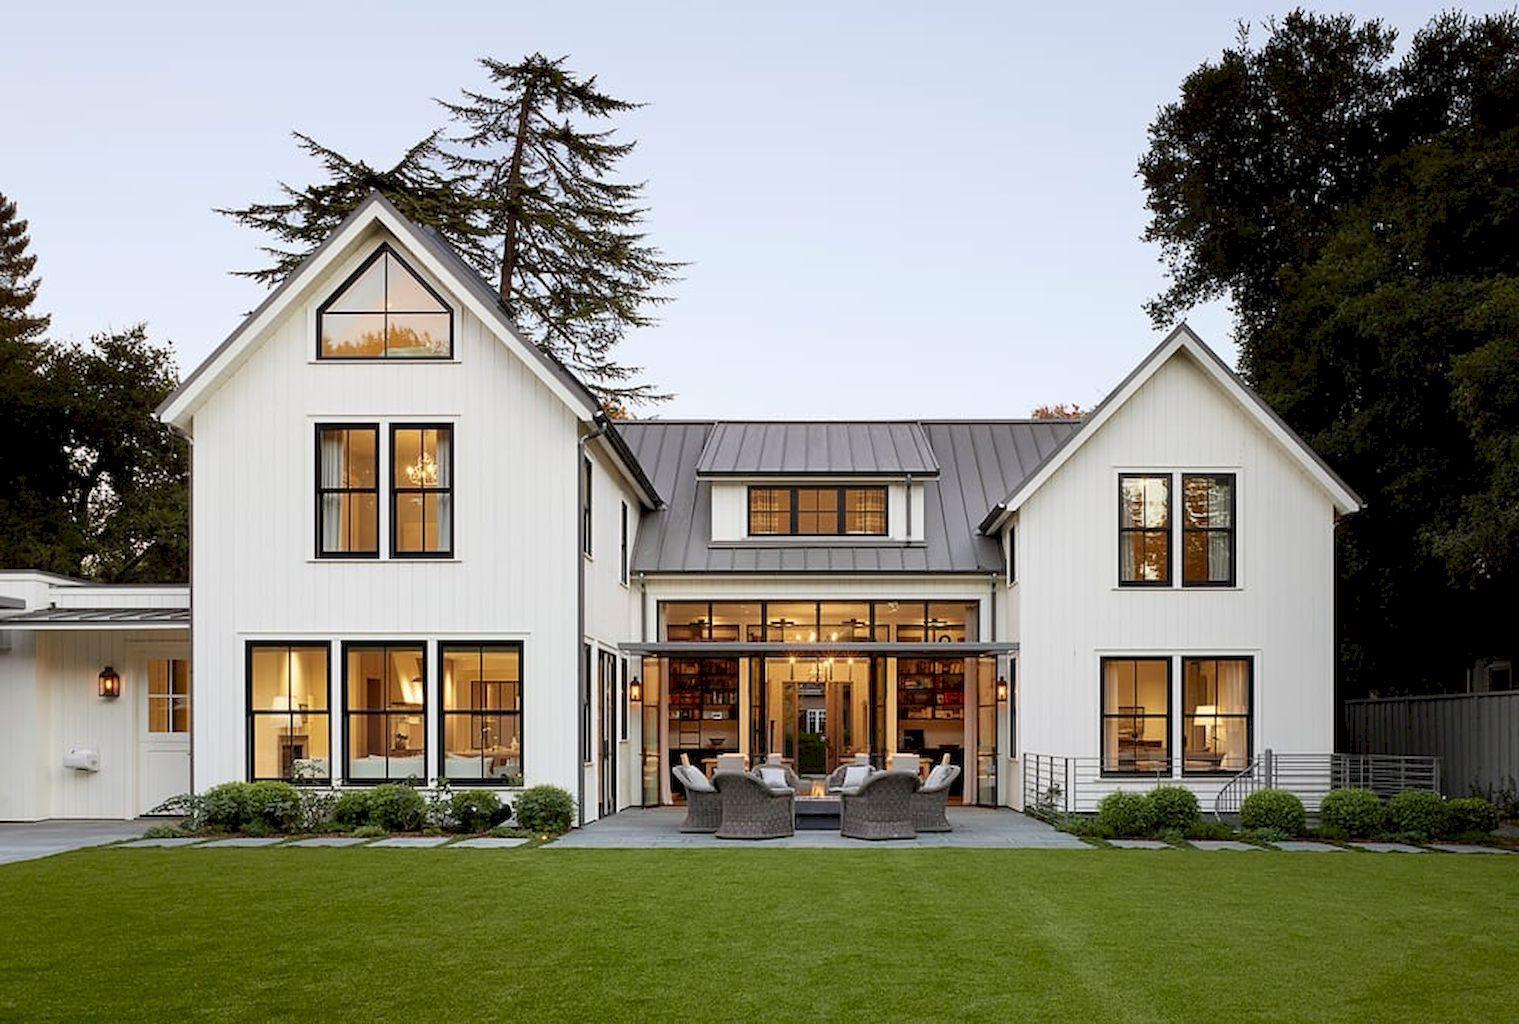 75 aesthetic farmhouse exterior design ideas | exterior design